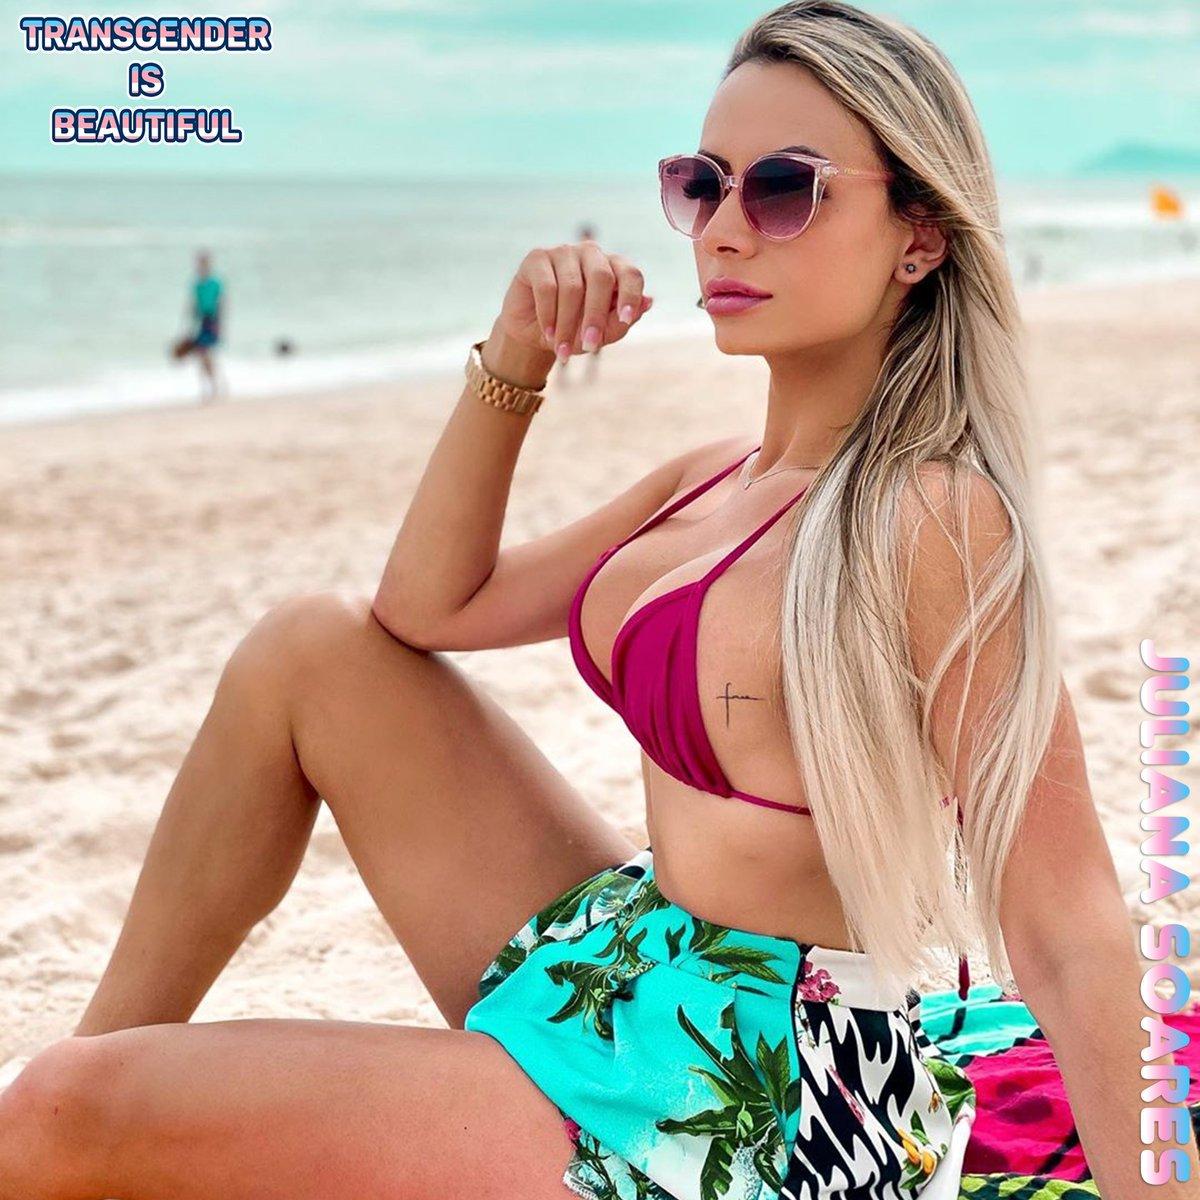 #TransIsBeautiful 🧚♀️ Juliana Soares — Beautiful #TransgenderWoman ⚧ transsingle.com #transgender #transgirls #mtf #beauty #transwoman #mtftransgende #lgbt #lgbtq #femme #girlslikeus #tgirl #tgwoman #tsgirl #transproud #julianasoares